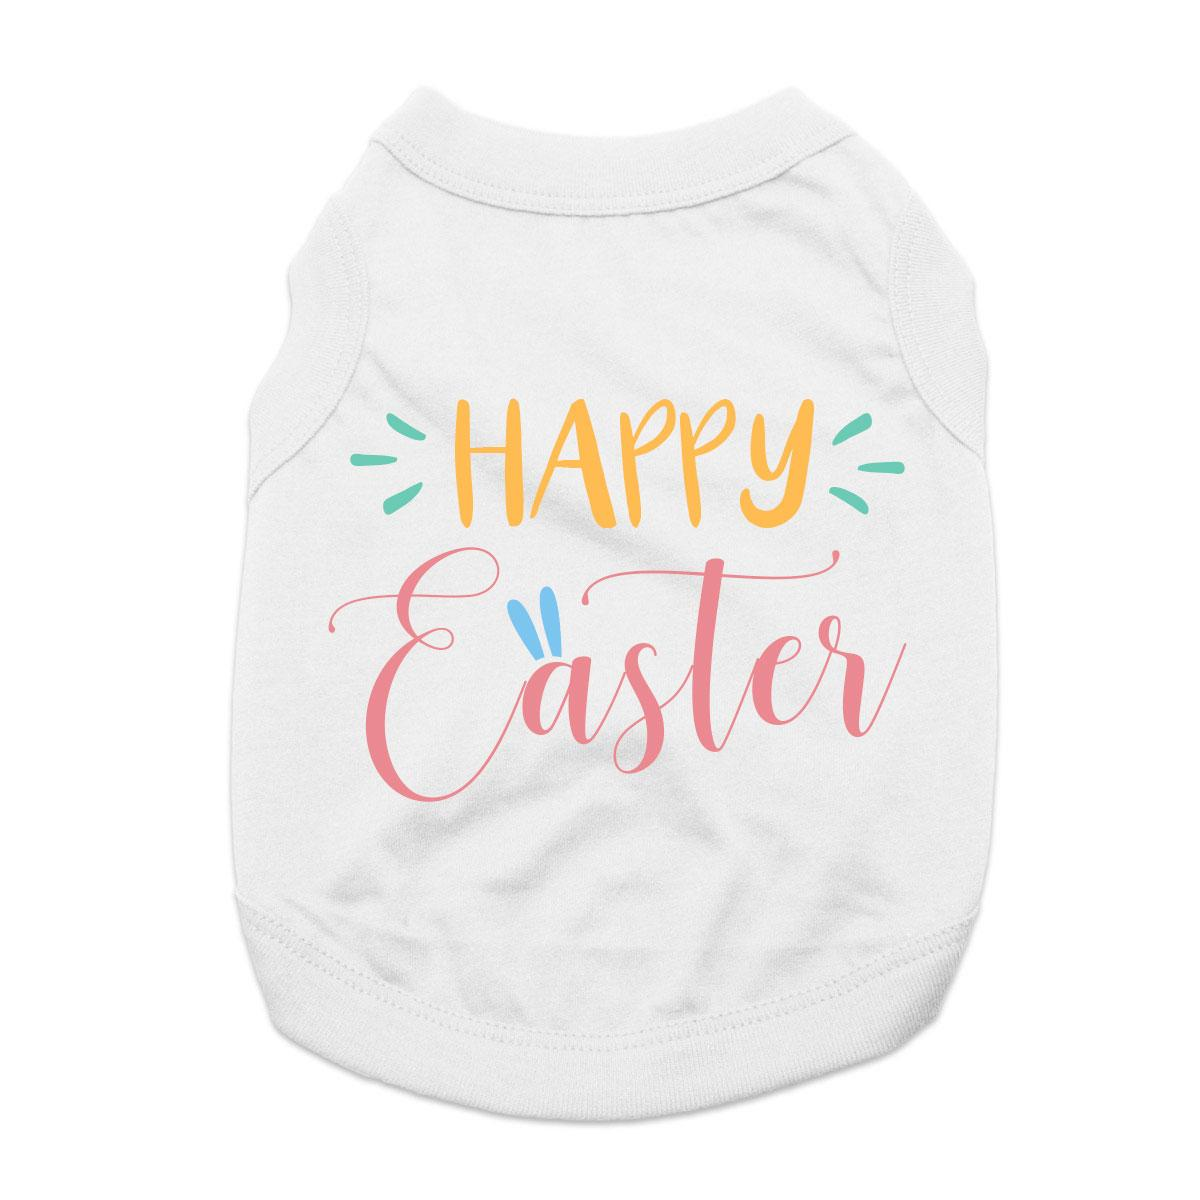 Happy Easter Dog Shirt - White